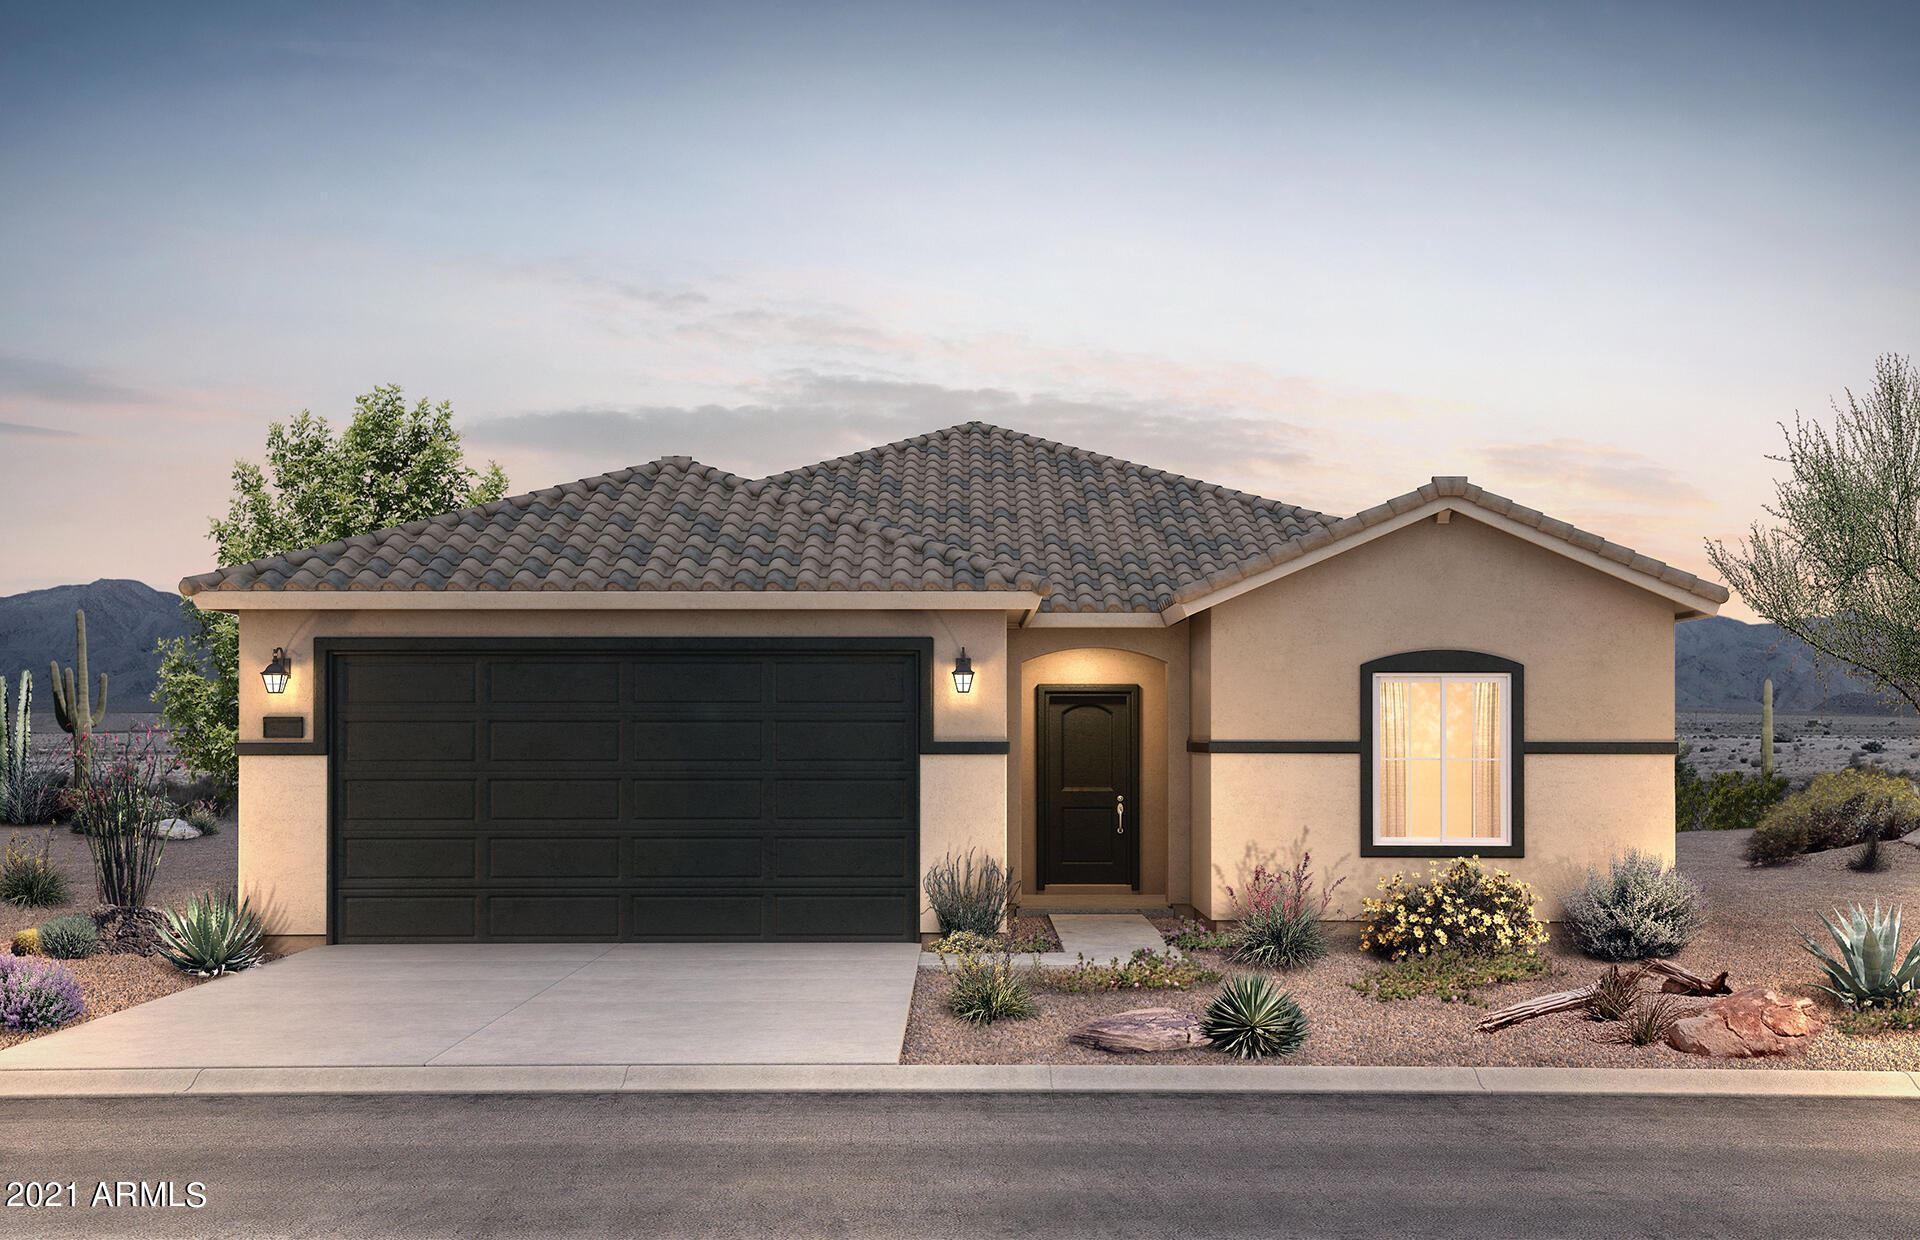 Photo for 43743 W MESCAL Street, Maricopa, AZ 85138 (MLS # 6273404)